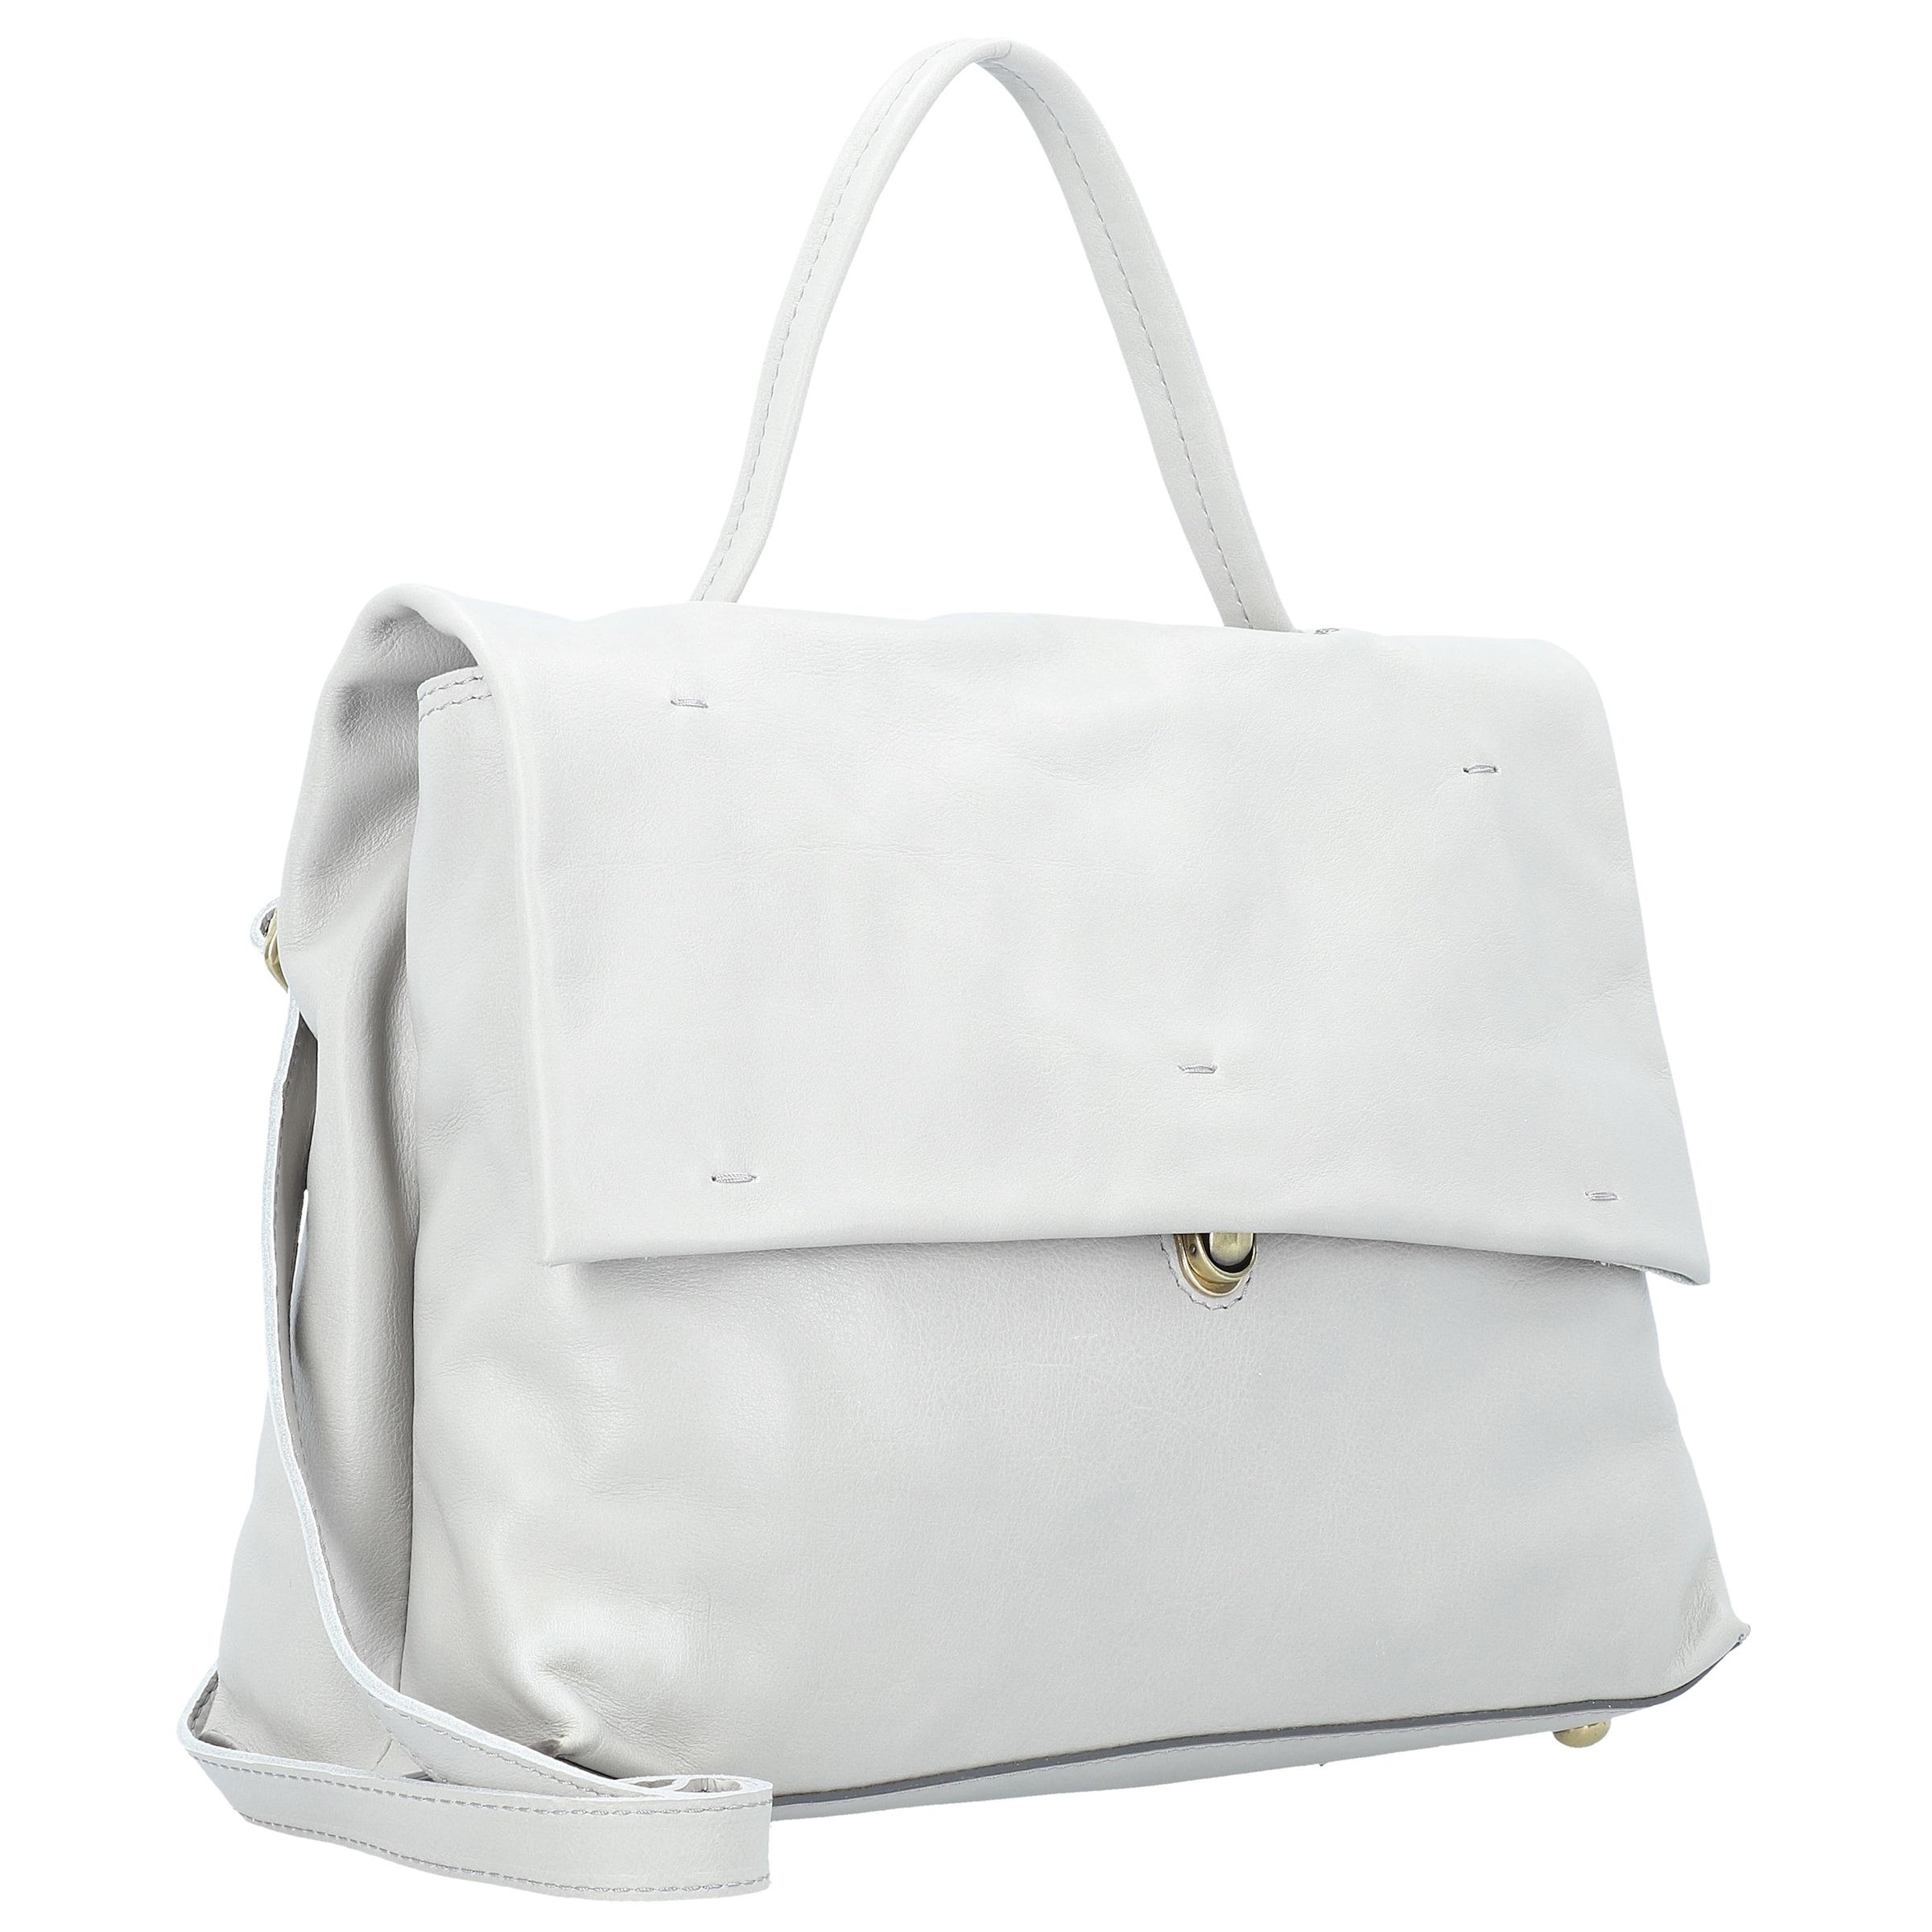 Campomaggi 'verona' In Handtasche HellbeigeGrau 'verona' Campomaggi Handtasche wk80OPn